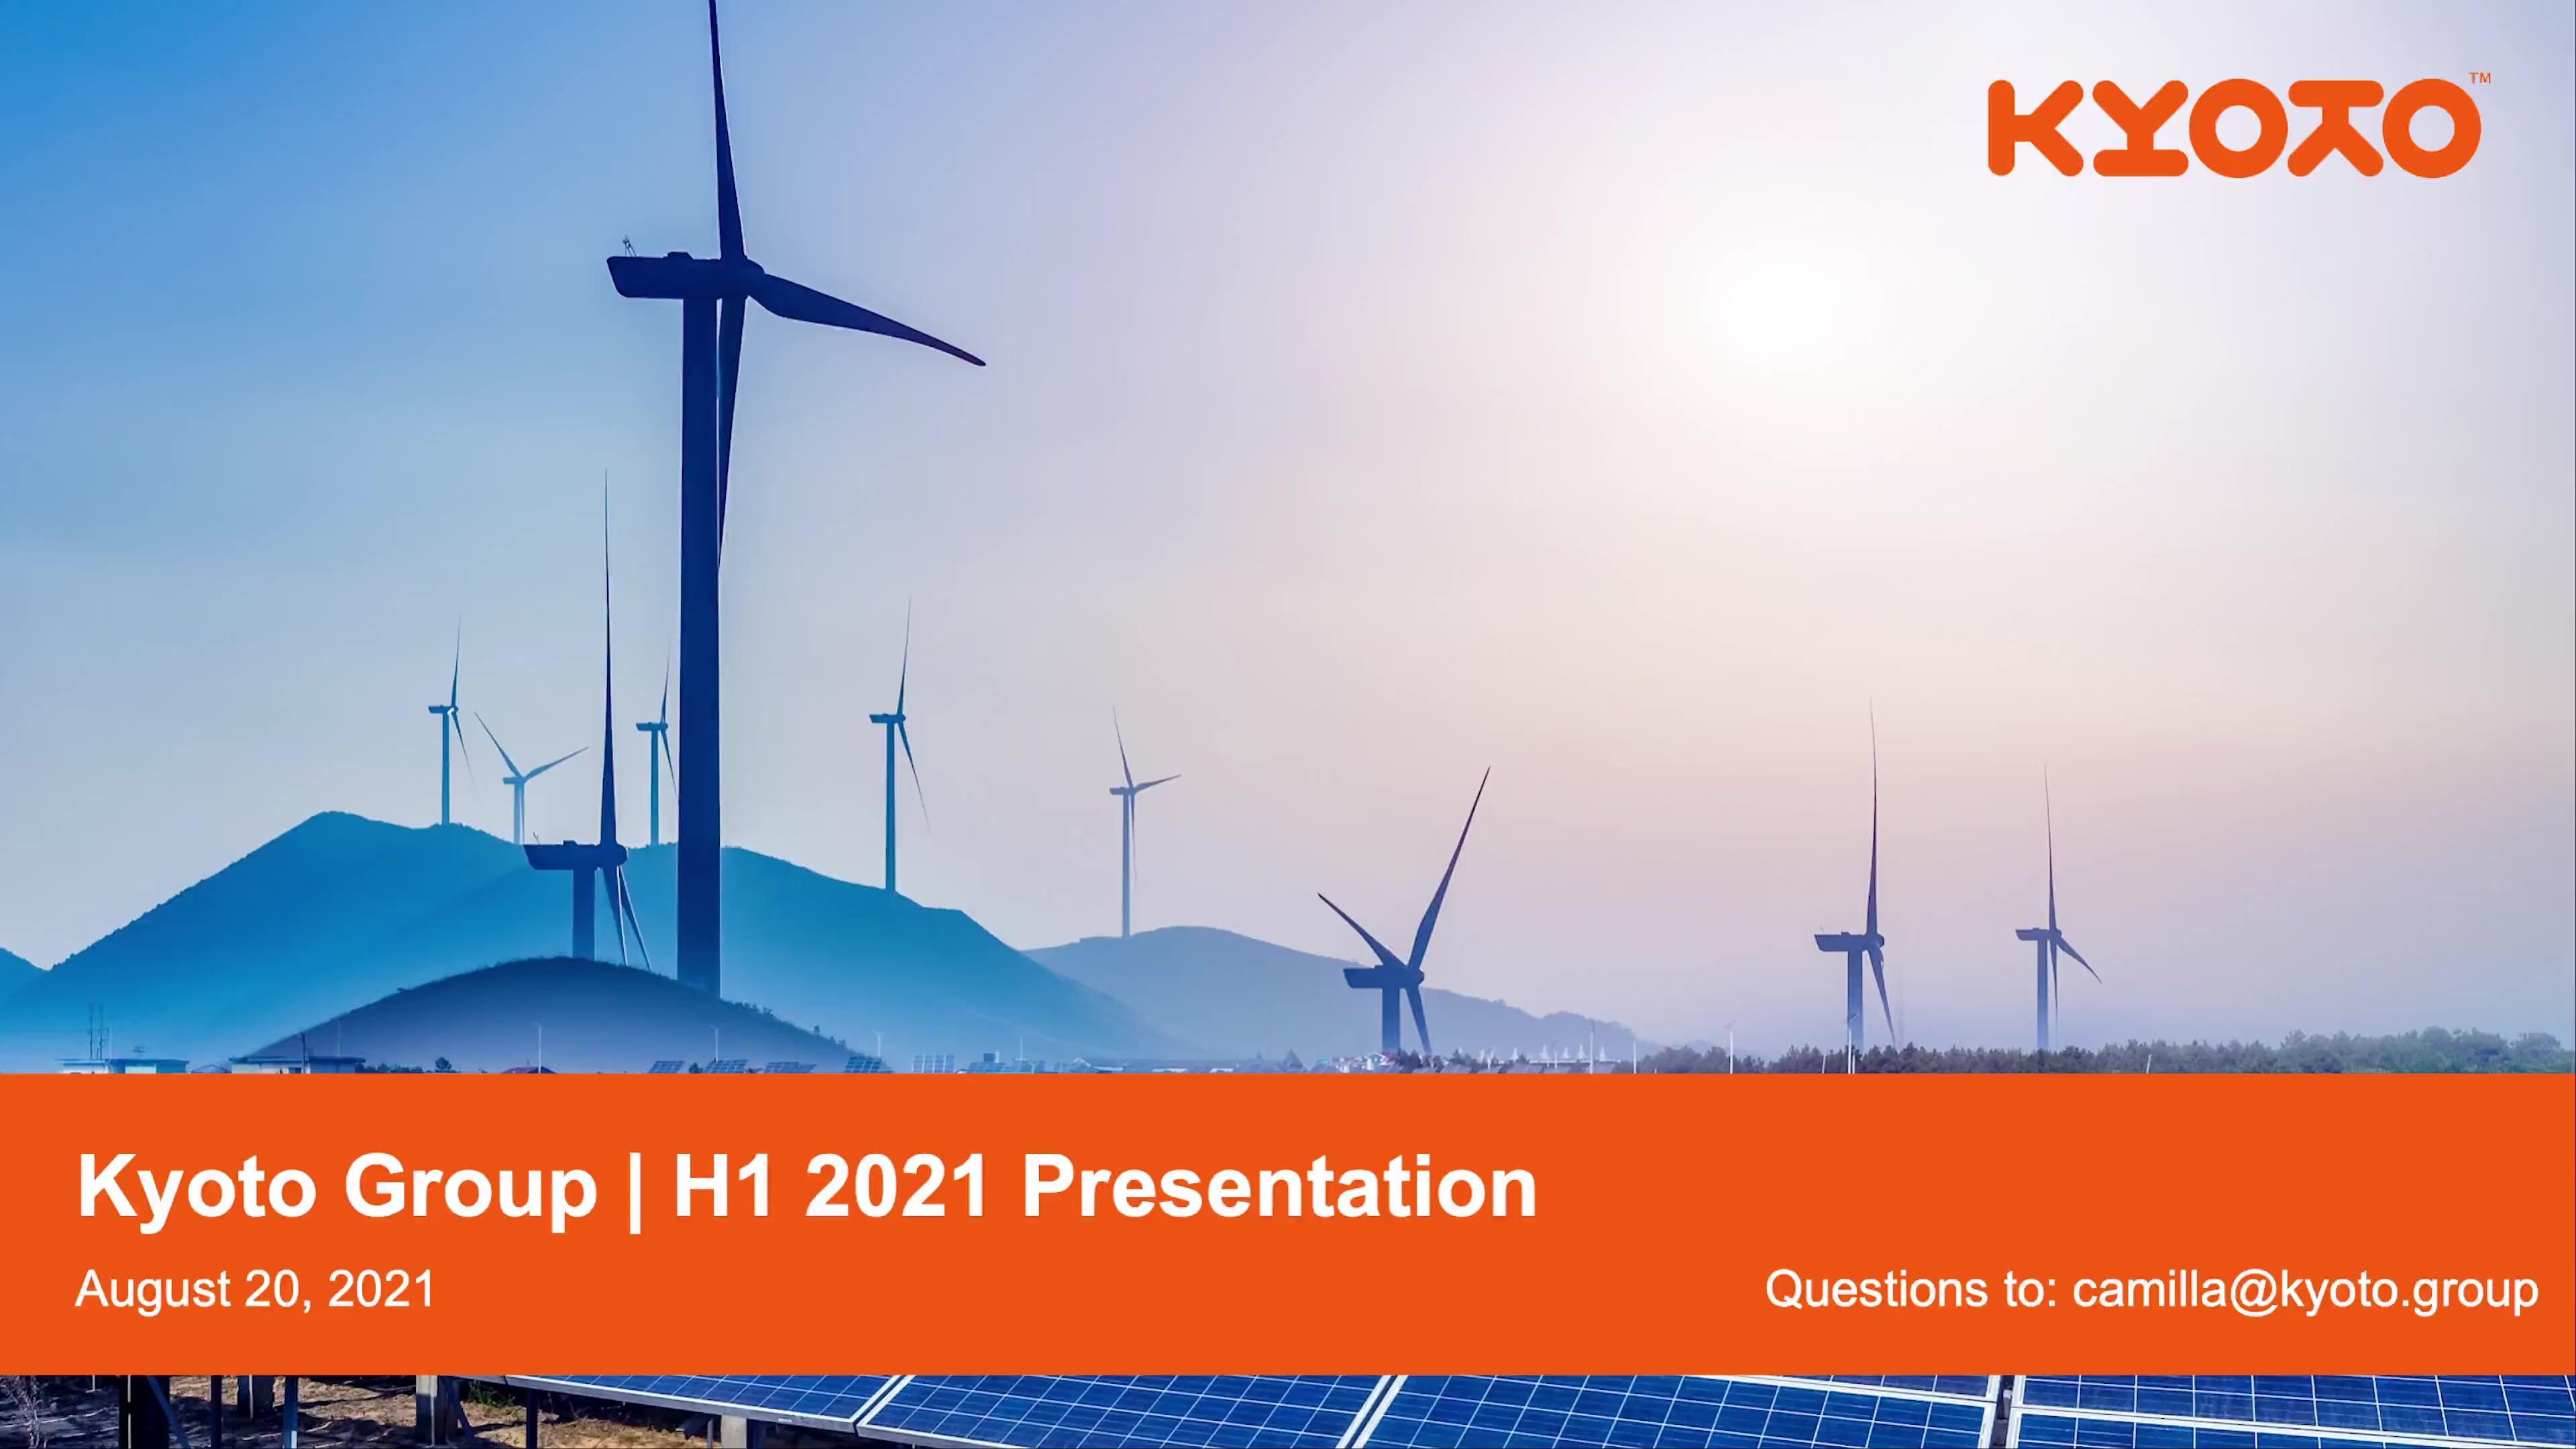 KYOTO H1 2021 presentasjon KORTVERSJON 01_1